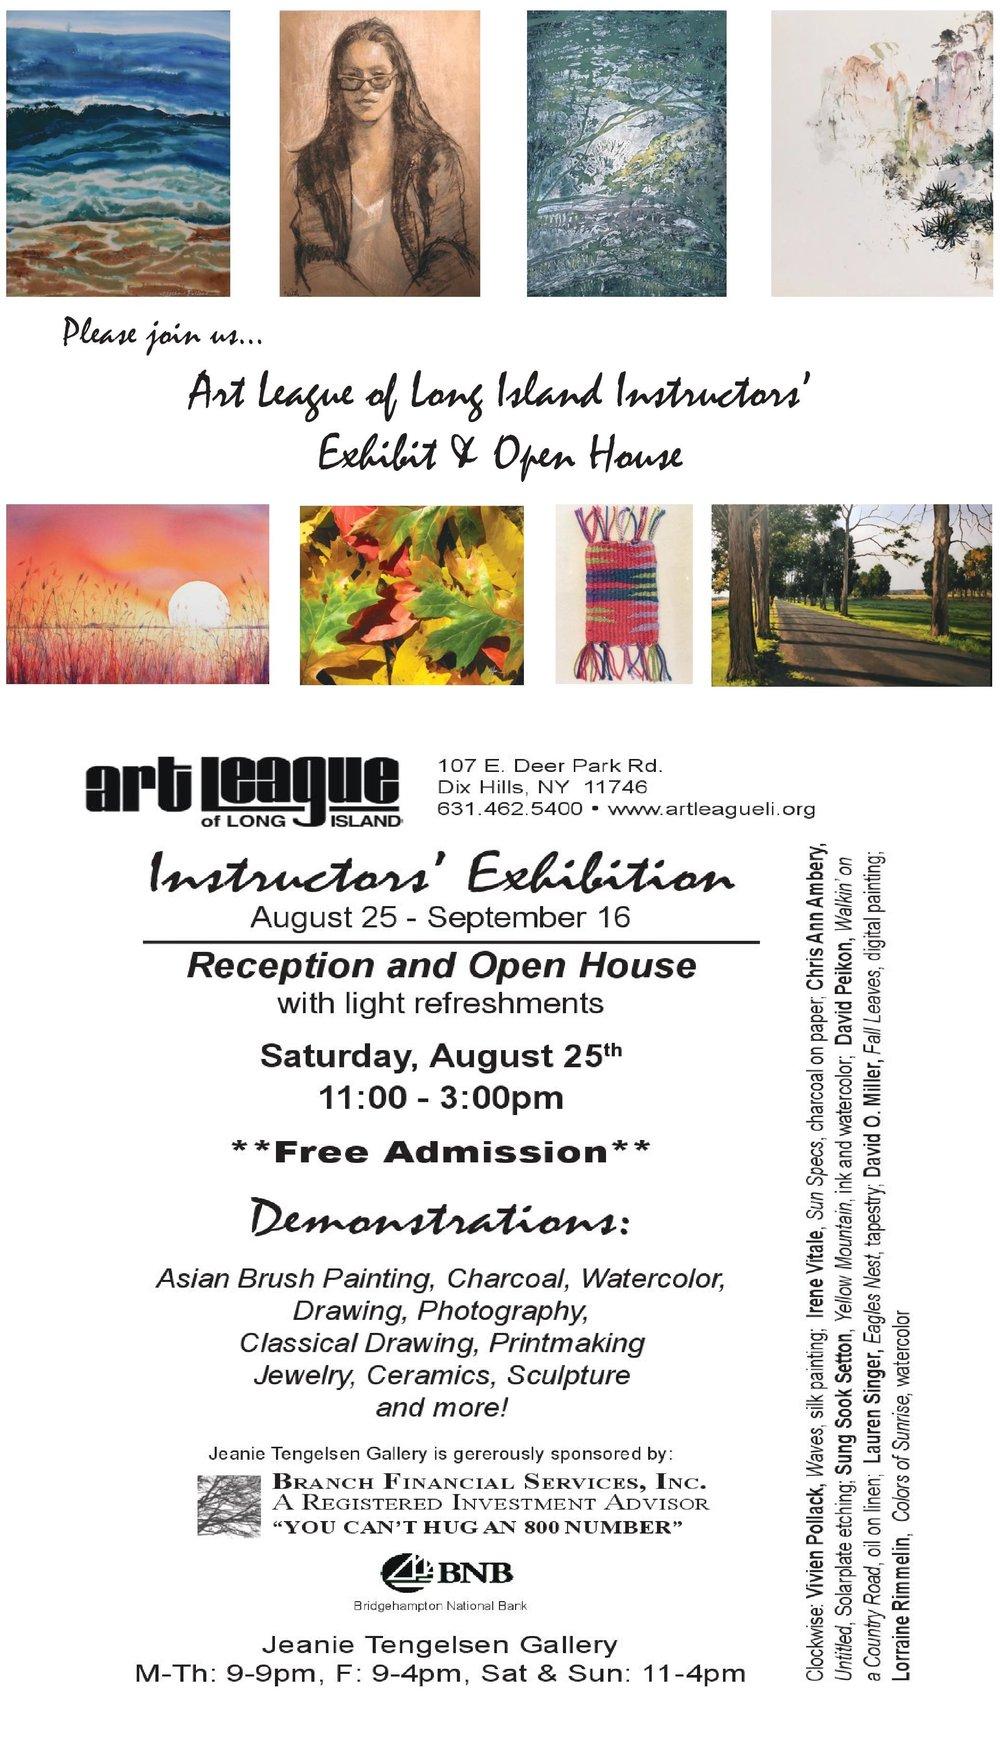 Iinstructors-Exhibition-2018-epostcard.jpg